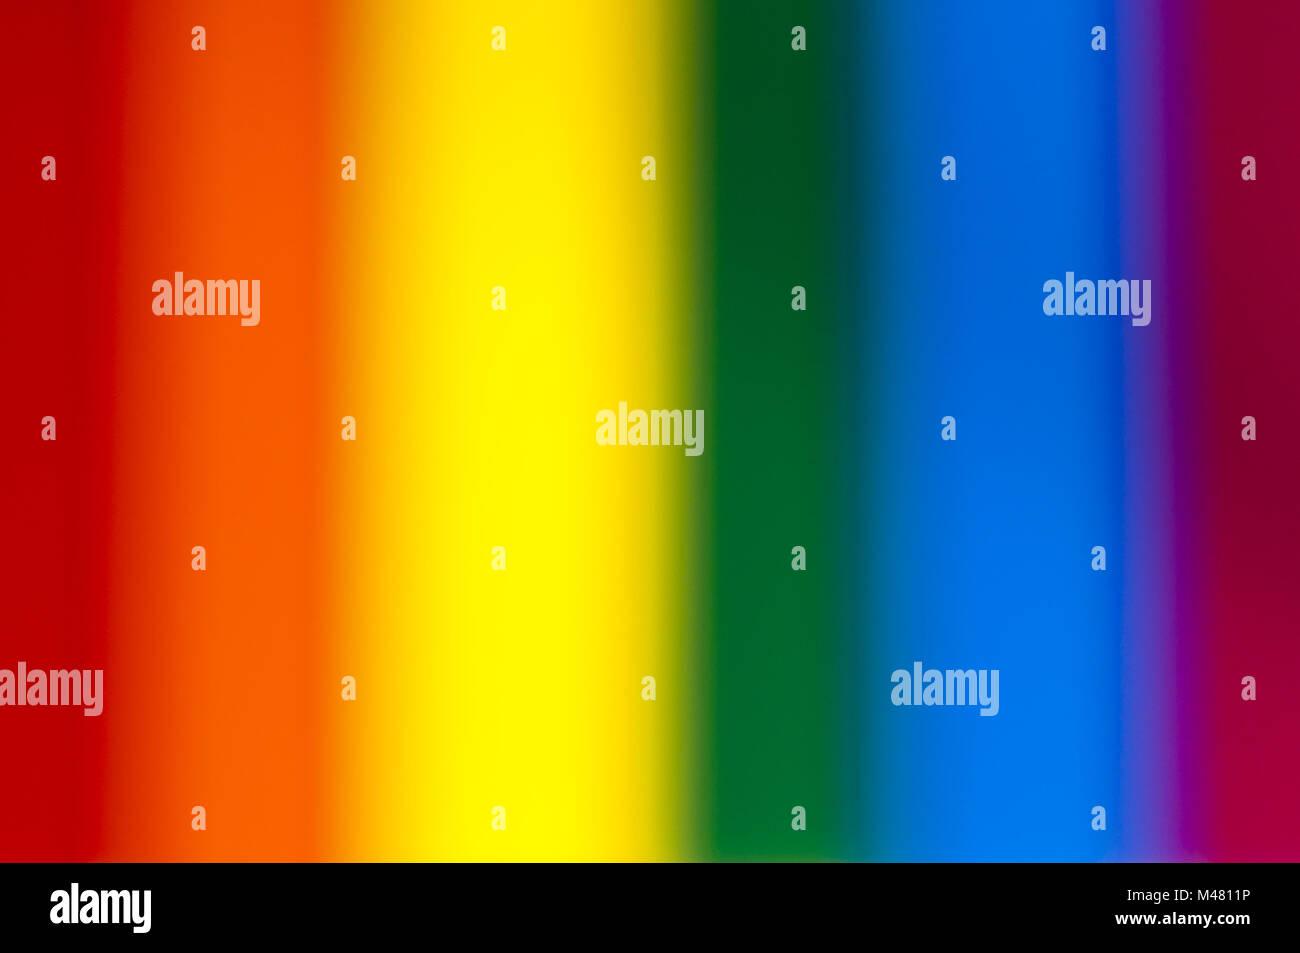 Blurred rainbow colors - Stock Image